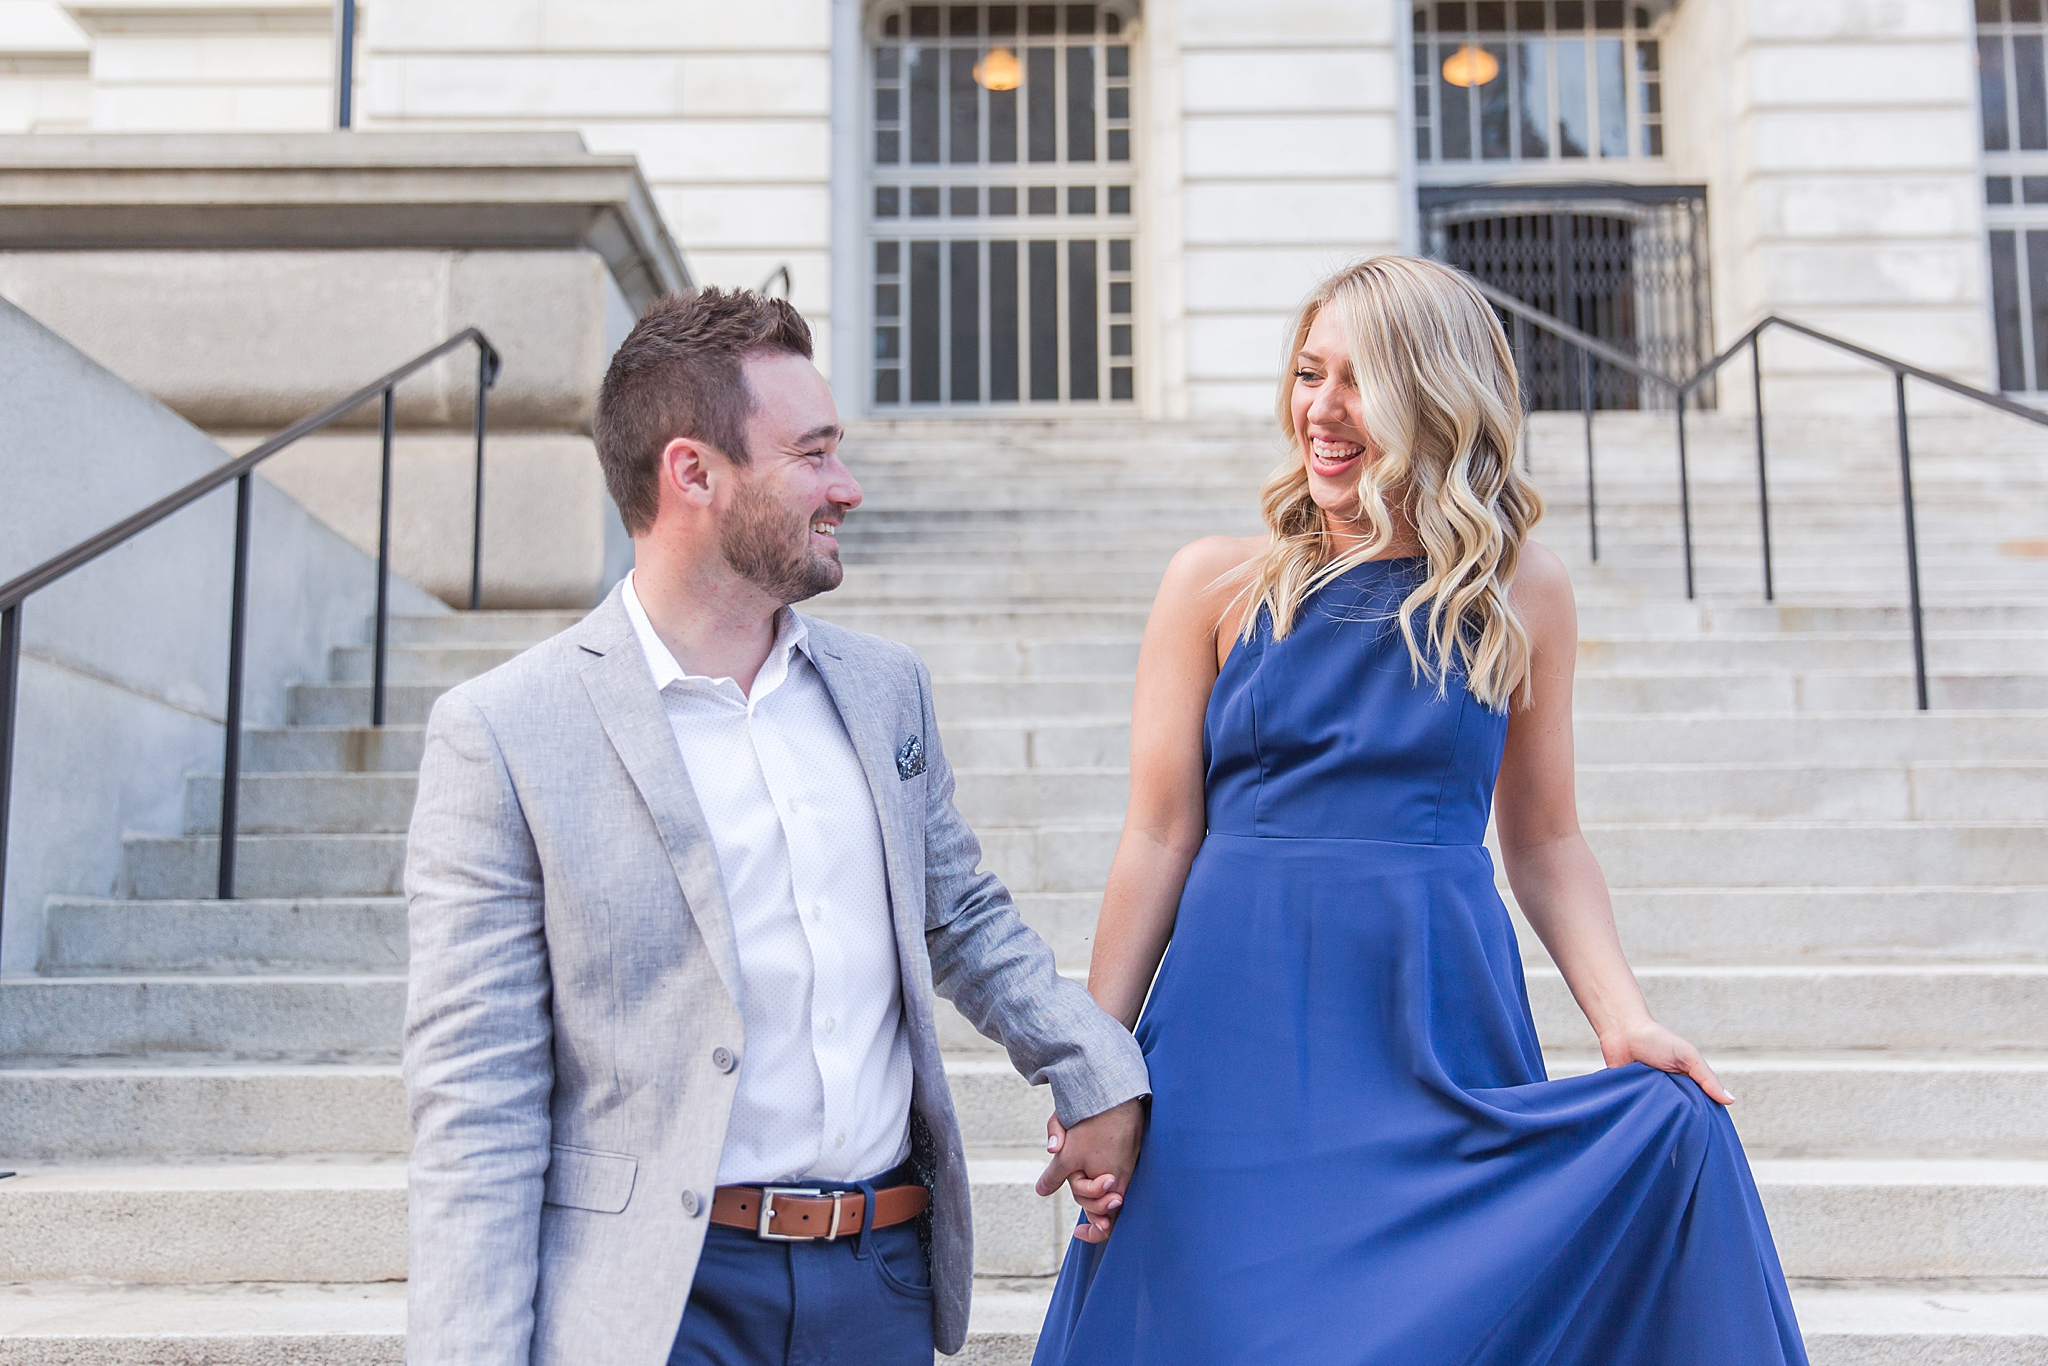 detroit-wedding-photographer-downtown-detroit-belle-isle-engagement-photos-sarah-eric-by-courtney-carolyn-photography_0035.jpg